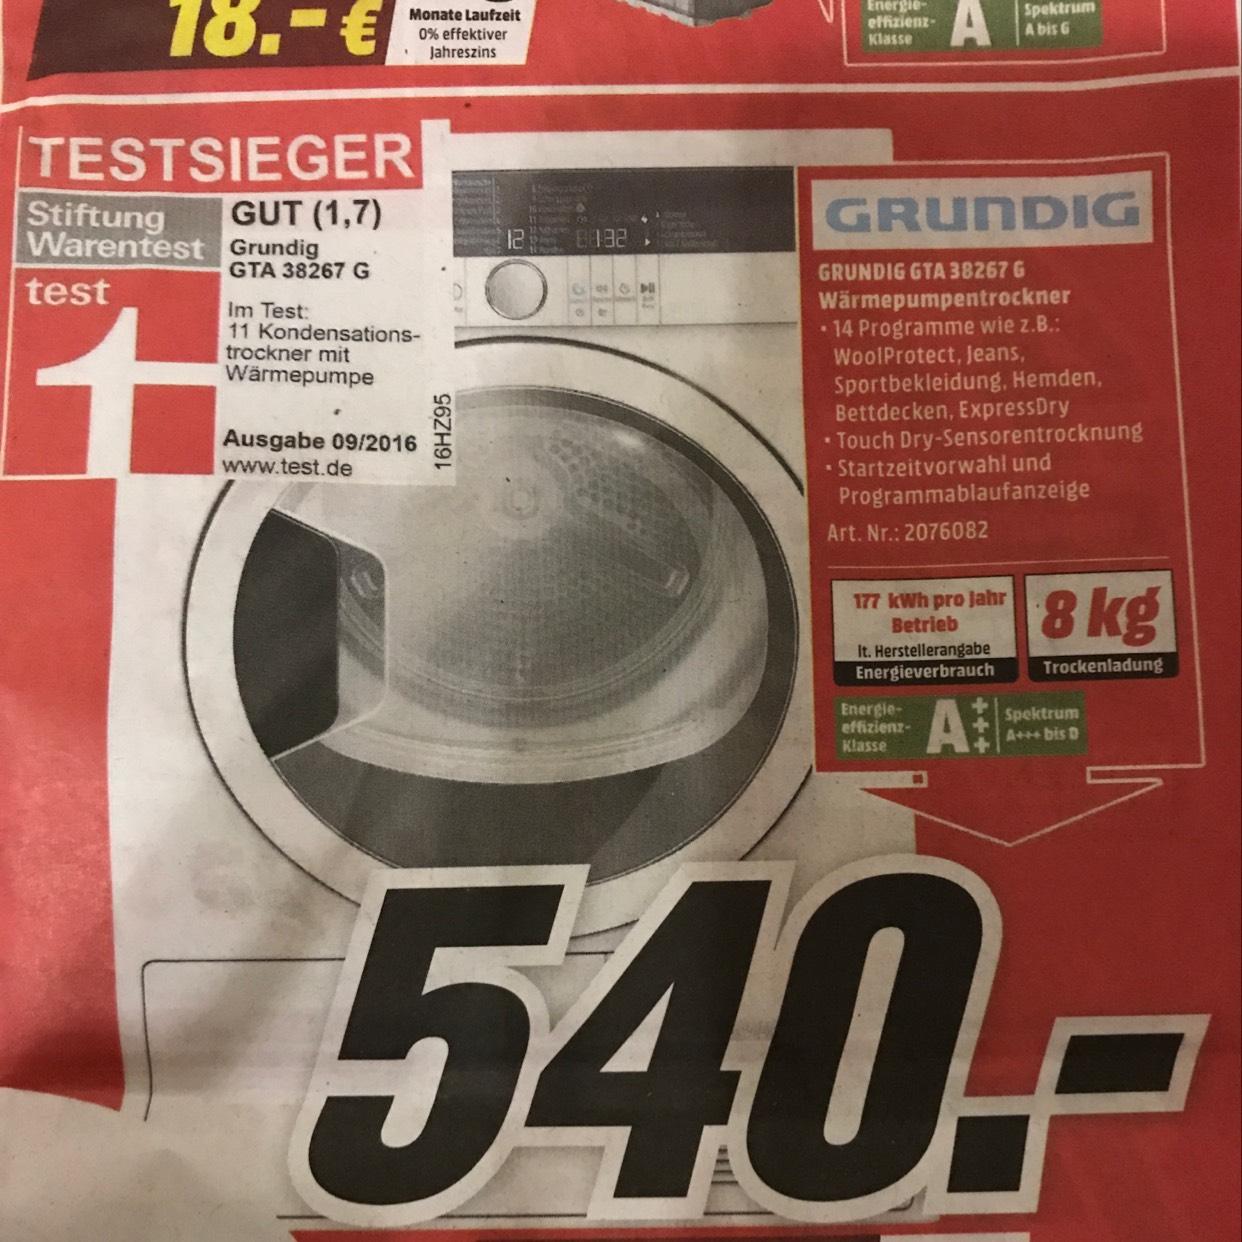 Lokal Grundig GTA 38267 G Wärmepumpentrockner ++Testsieger++